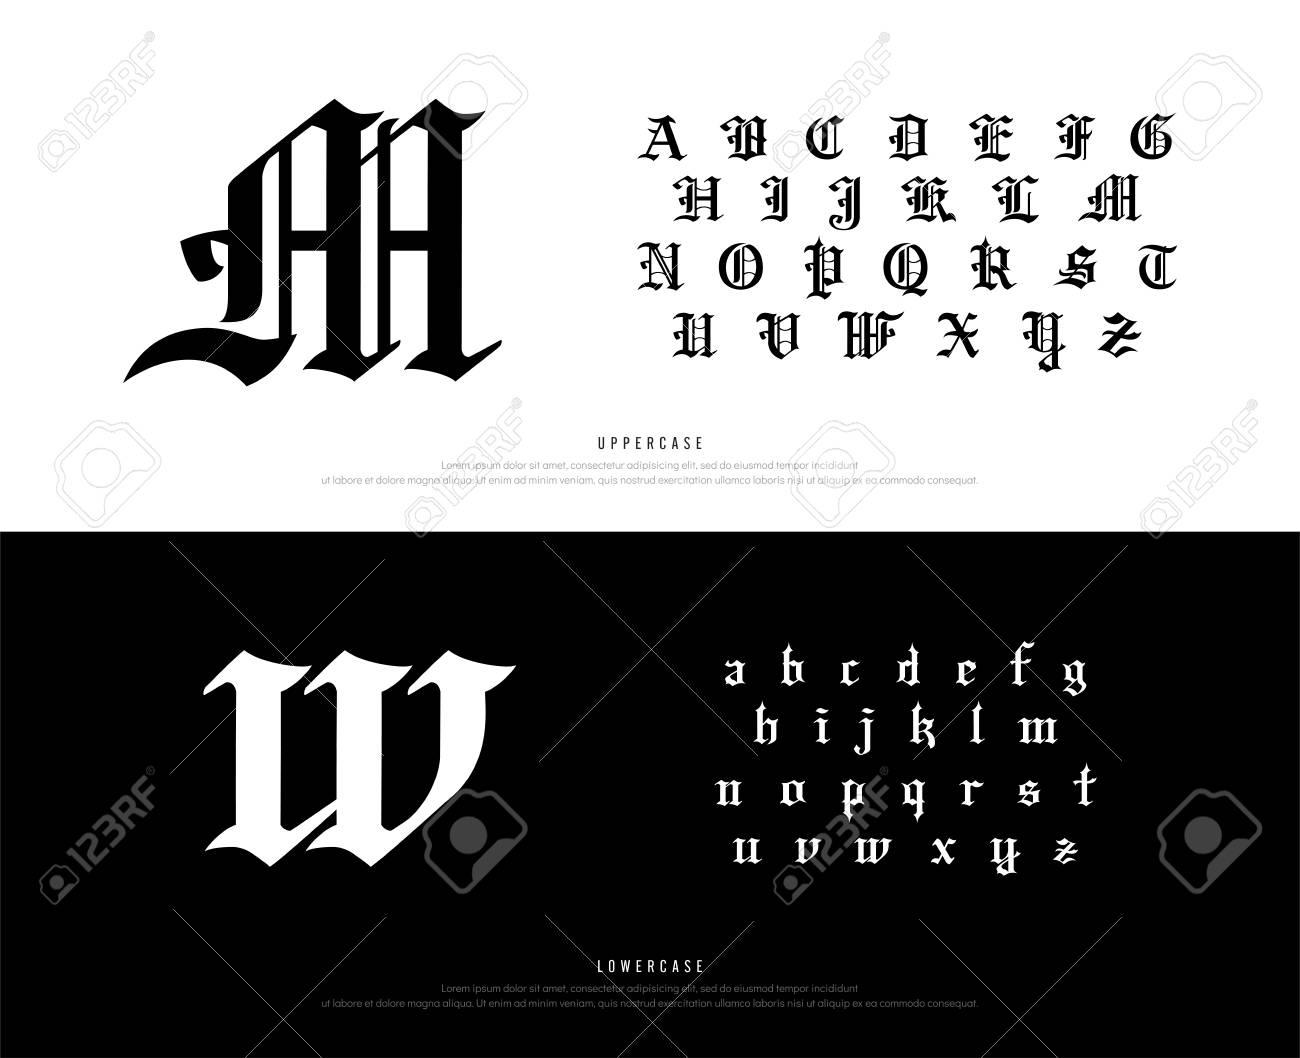 Elegant Blackletter Gothic Alphabet Font. Typography classic style font set for logo, Poster, Invitation. vector illustration.eps - 127726636